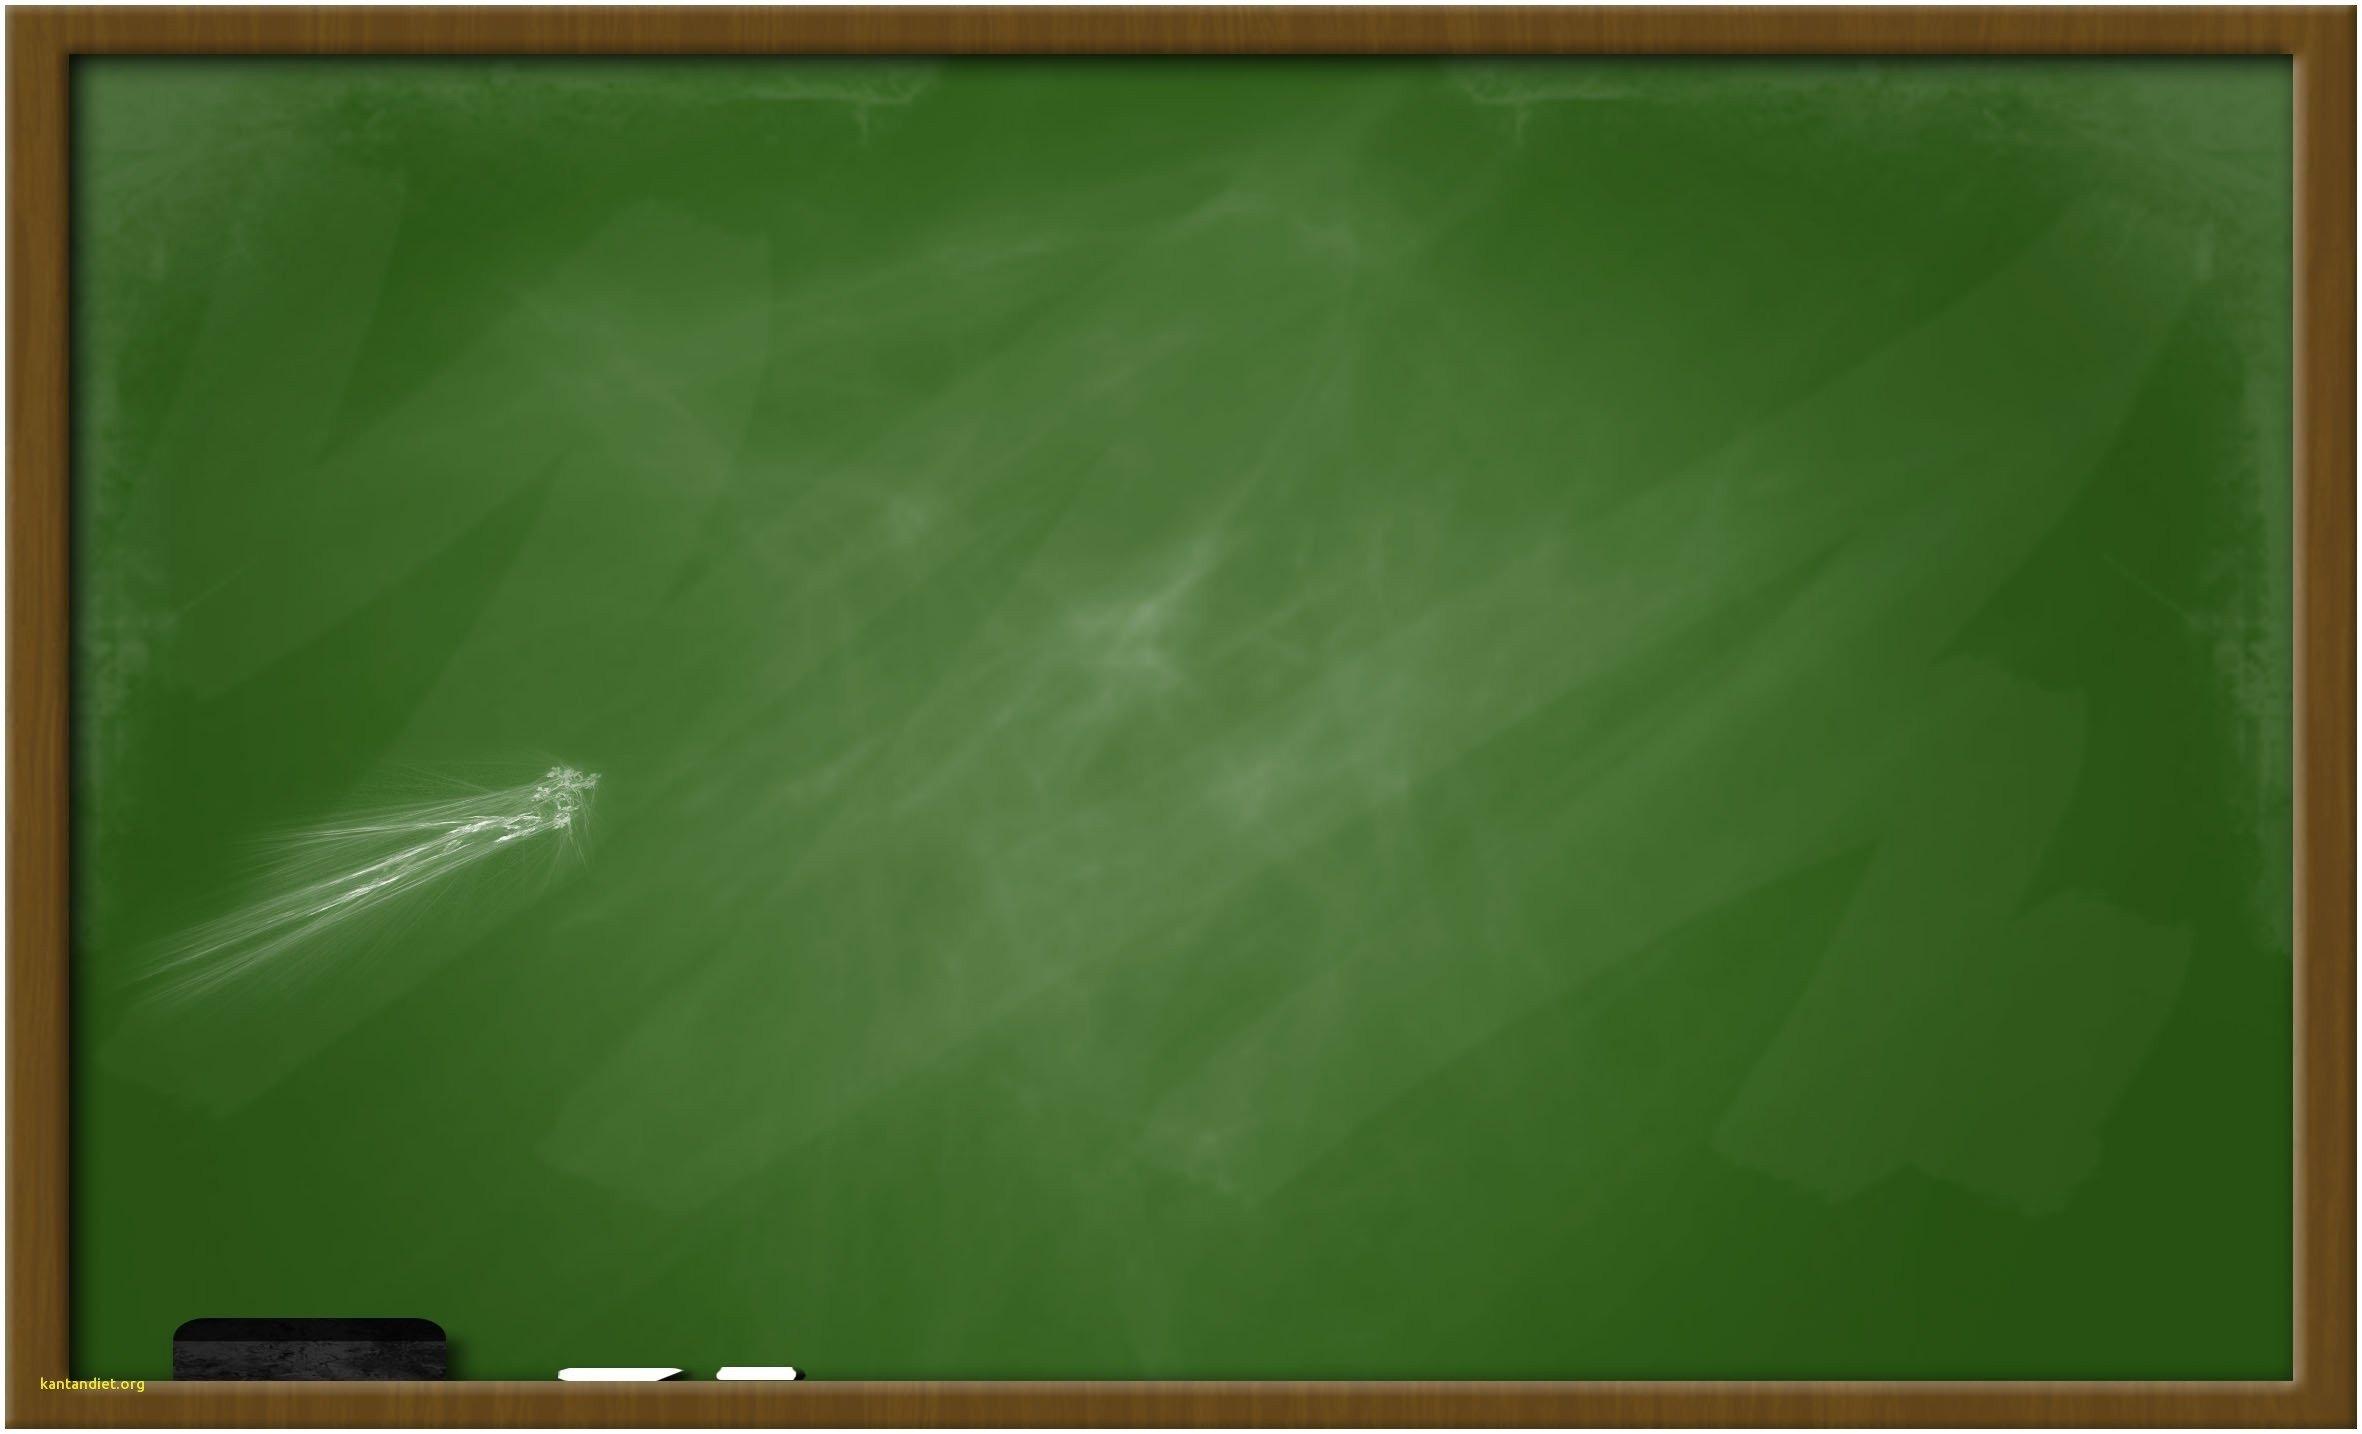 Background clipart chalkboard. Powerpoint incep imagine ex